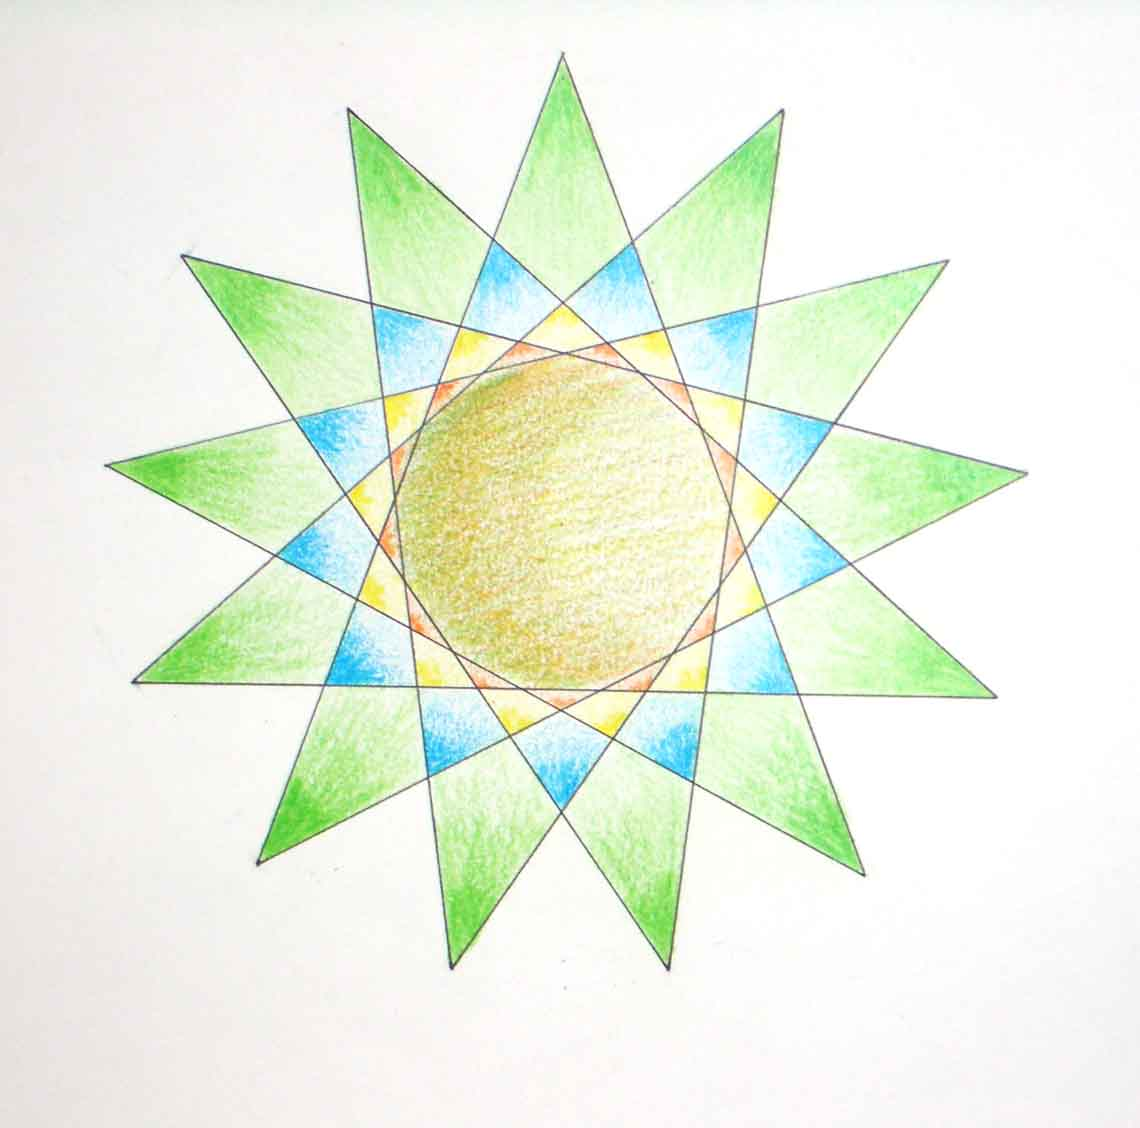 Saperedibujo Polgonos estrellados 3 ESO